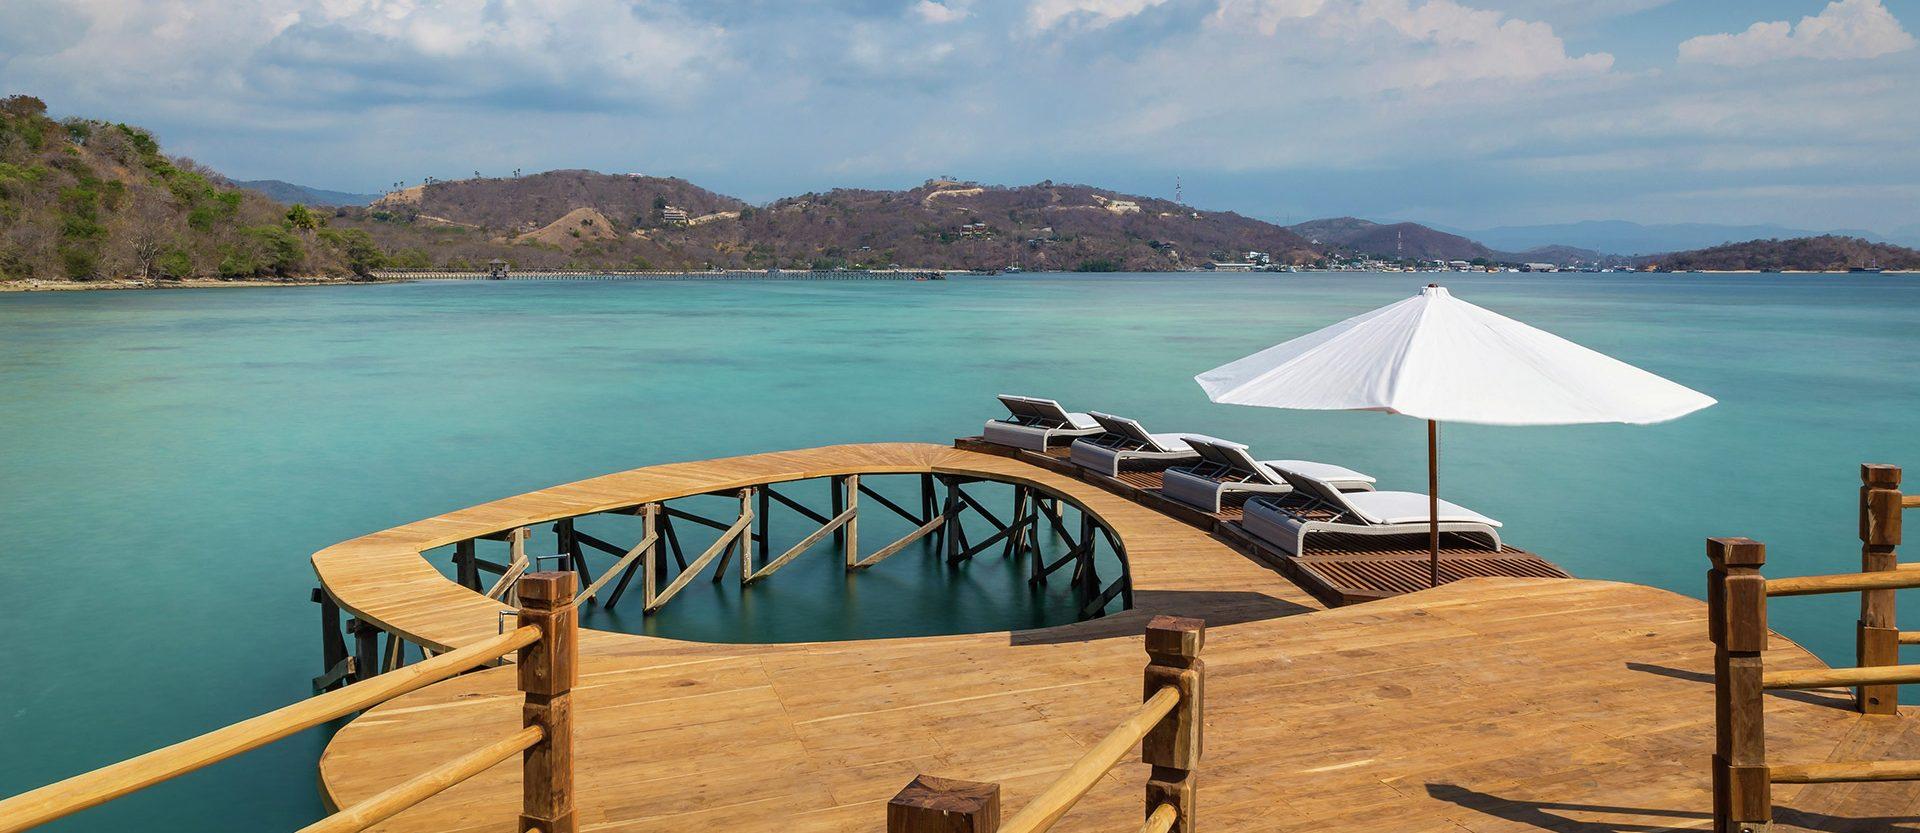 Asia's Best Beach Destinations | Passport Magazine